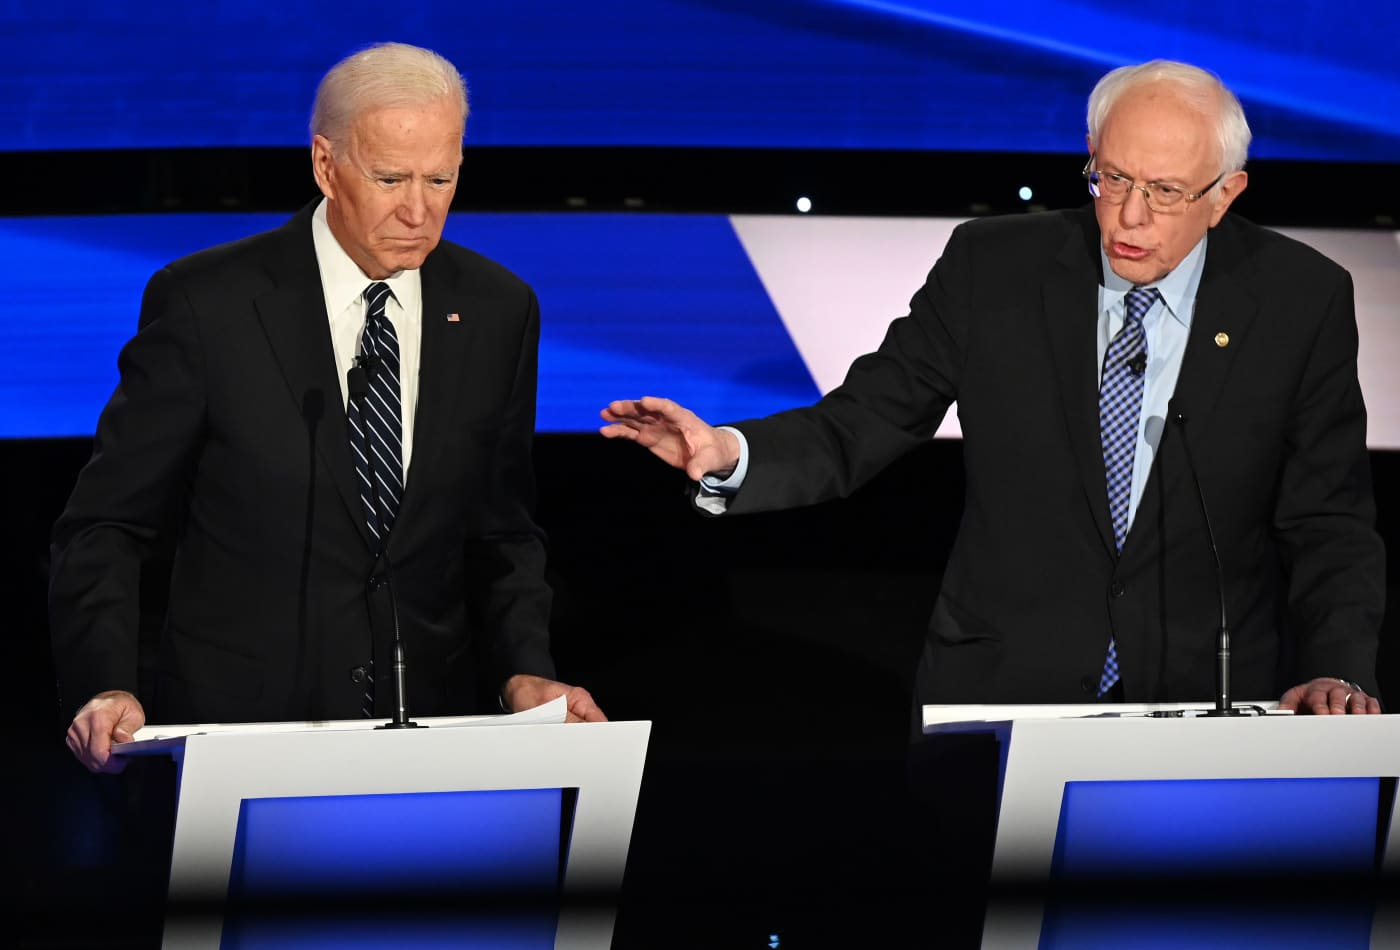 Bernie Sanders cuts into Joe Biden's polling lead, while Mike Bloomberg's cash burn helps him gain ground